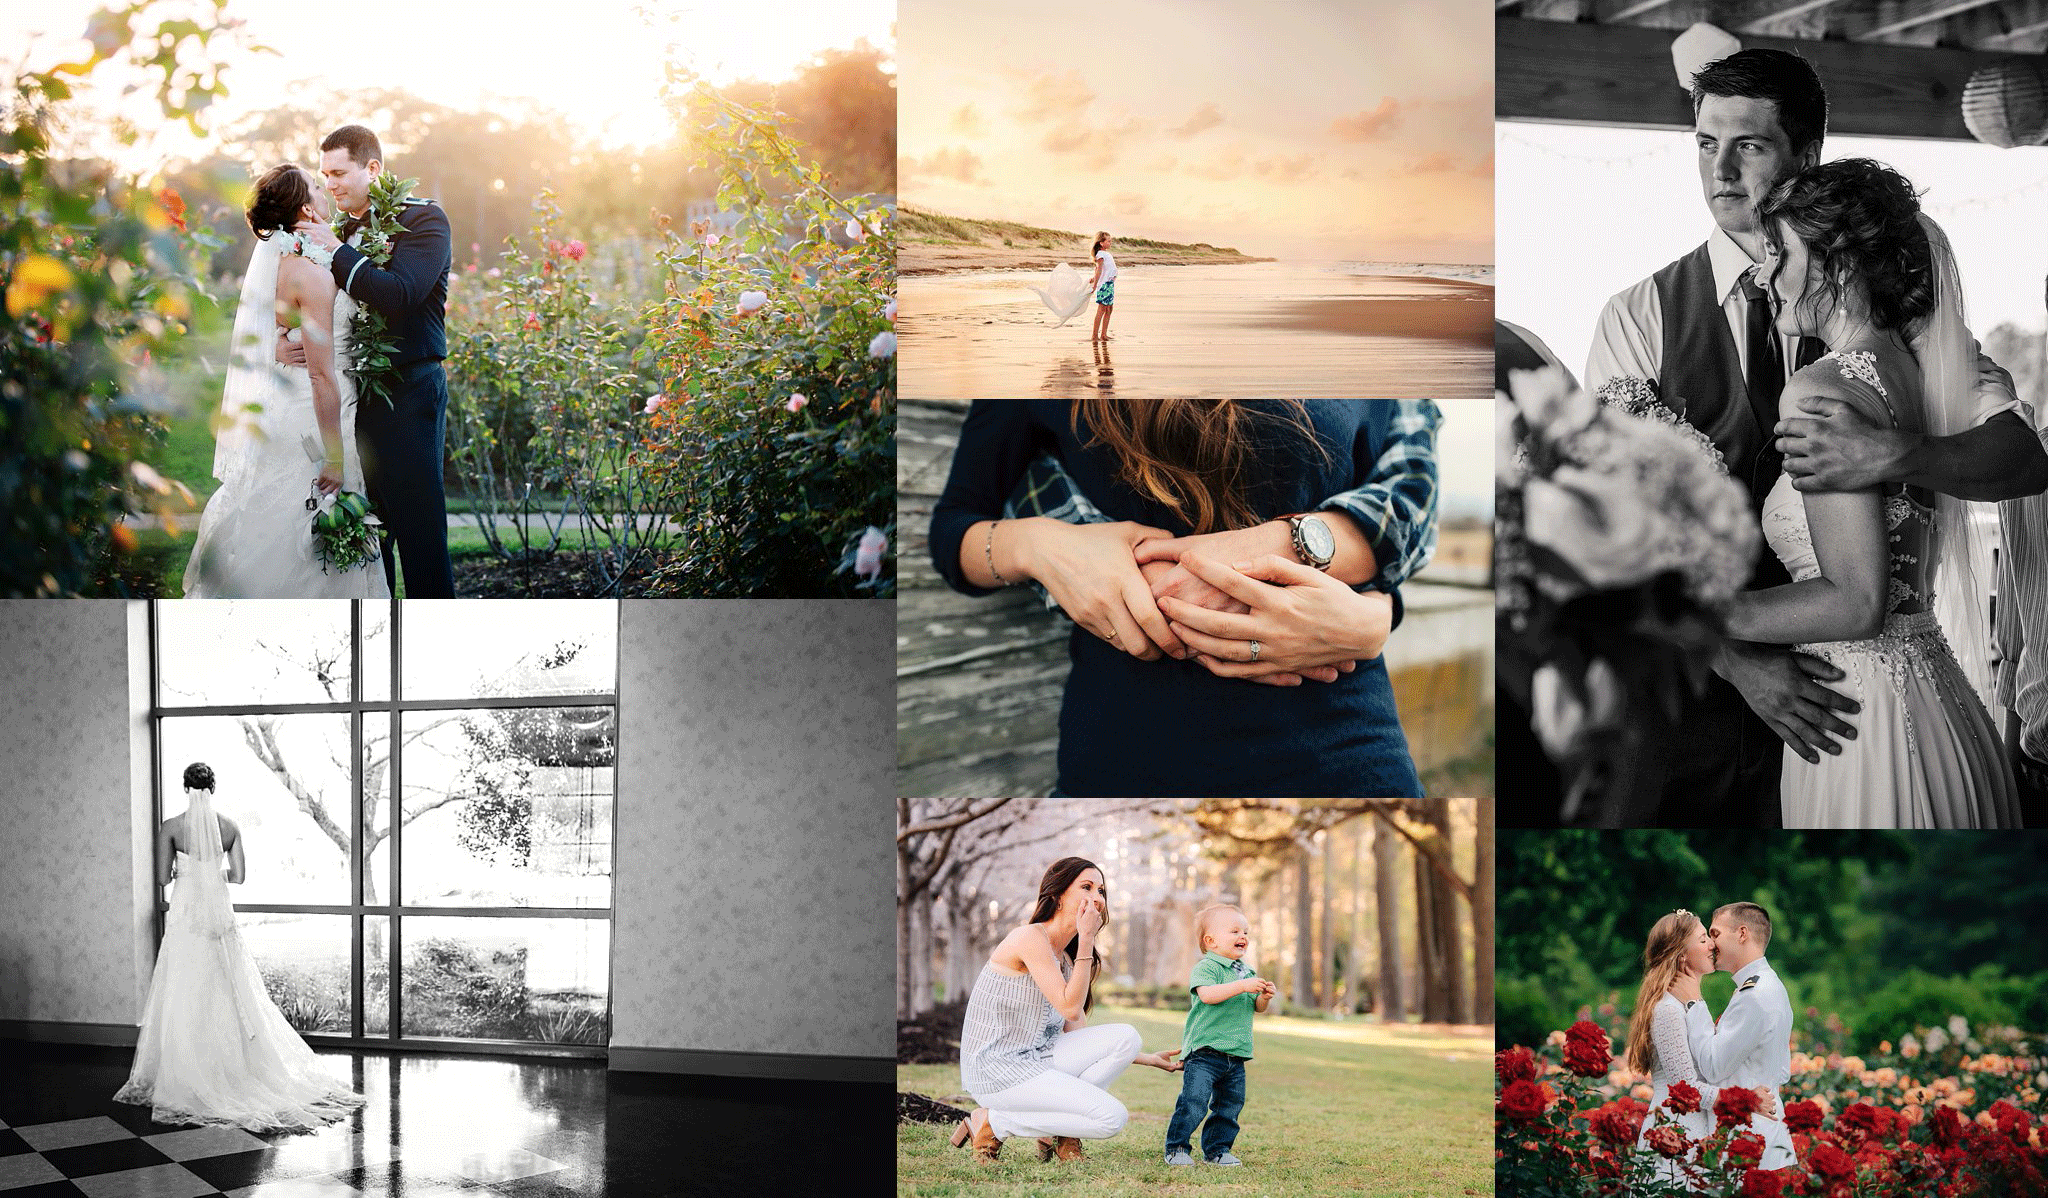 top-wedding-family-engagement-newborn-photographer-virginia-beach-norfolk-portsmouth-chesapeake-sandbridge-suffolk-williamsburg-melissa-bliss-photography.